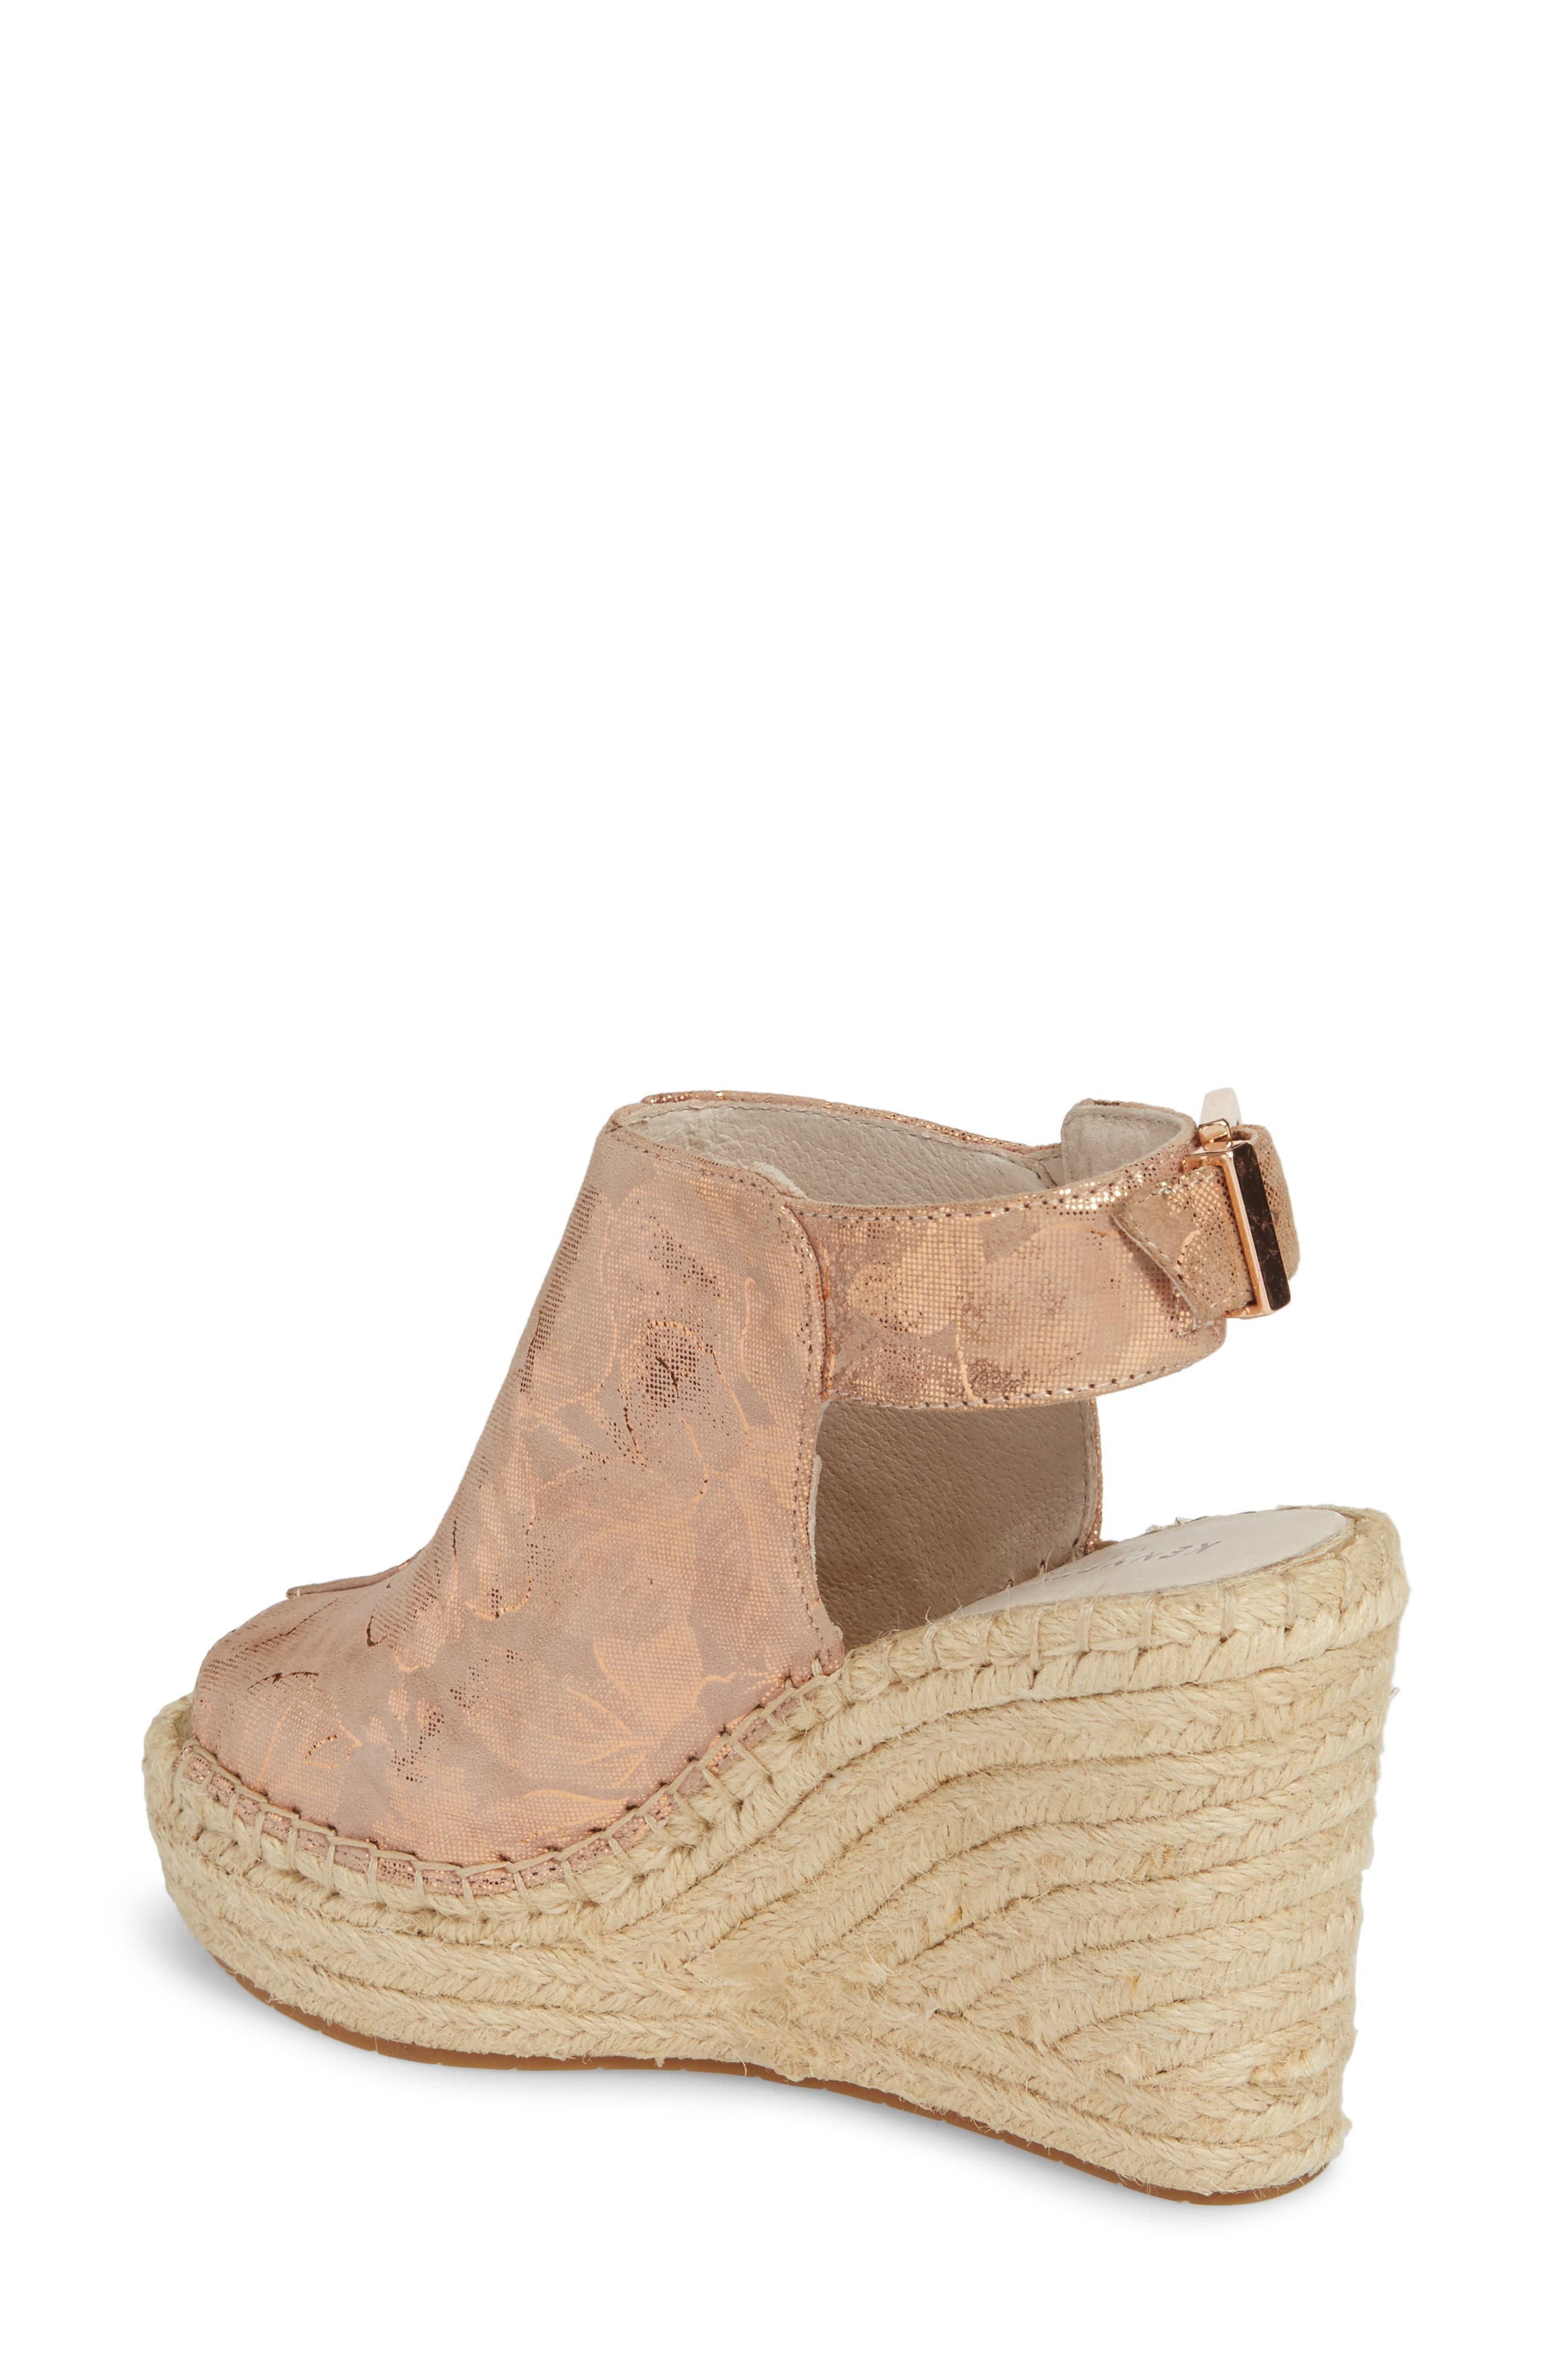 Alternate Image 2  - Kenneth Cole New York 'Olivia' Wedge Sandal (Women)